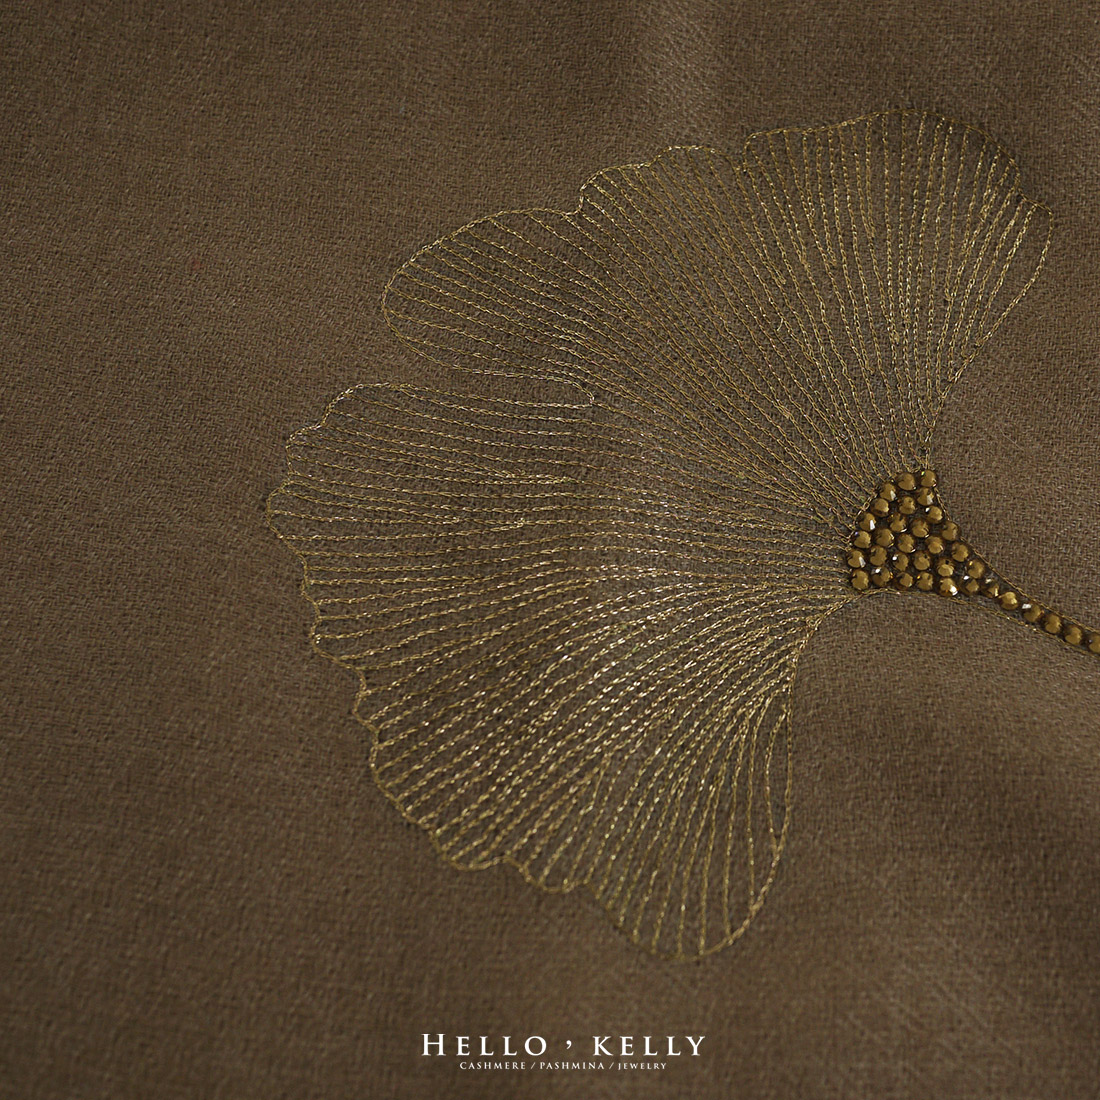 羊絨圍巾Cashmere|金色手繡羊絨佐鑲Swarovski